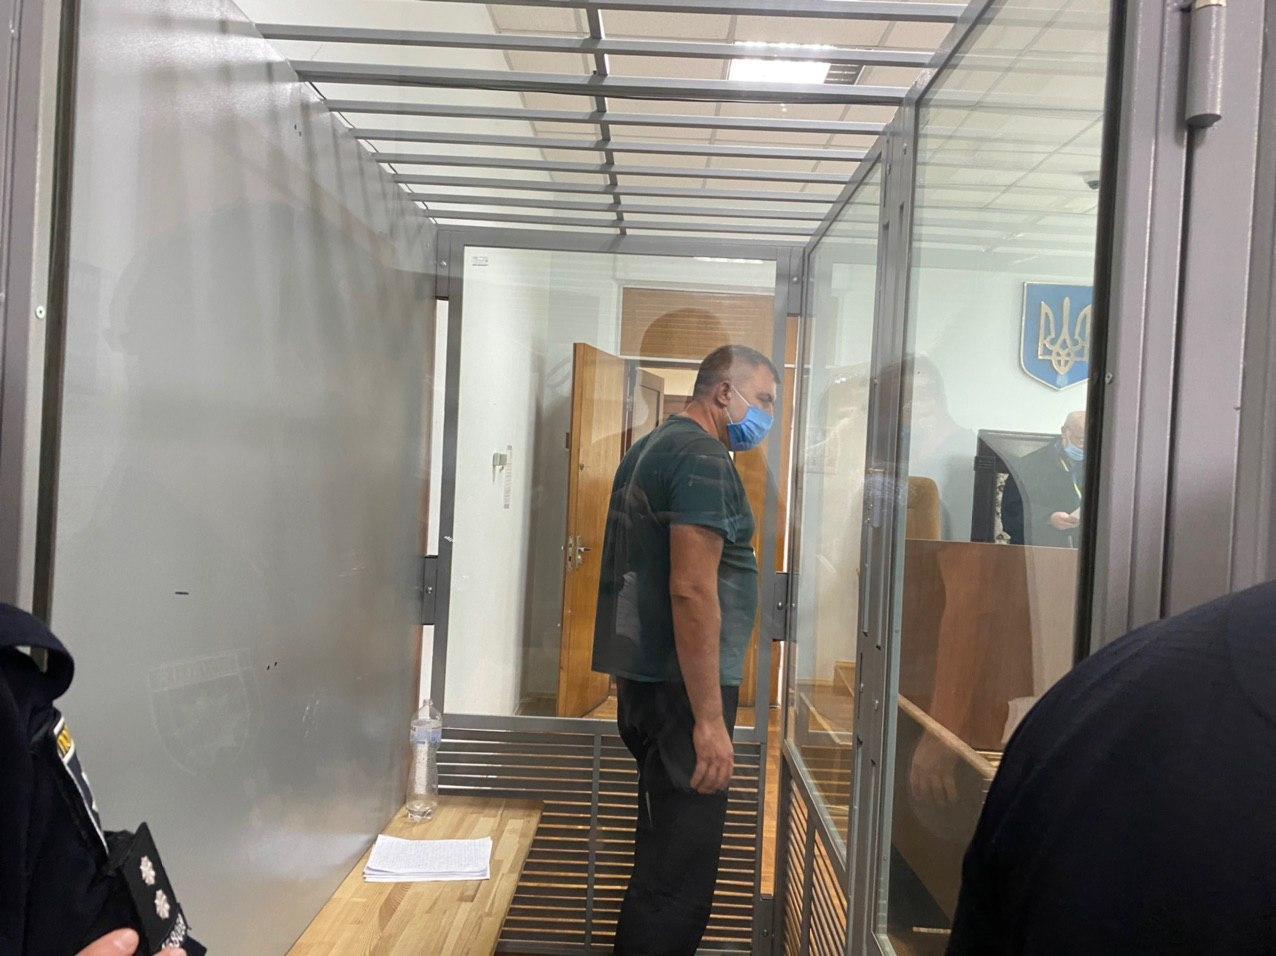 Суд взял под стражу подозреваемого в пособничестве луцкому террористу (фото)